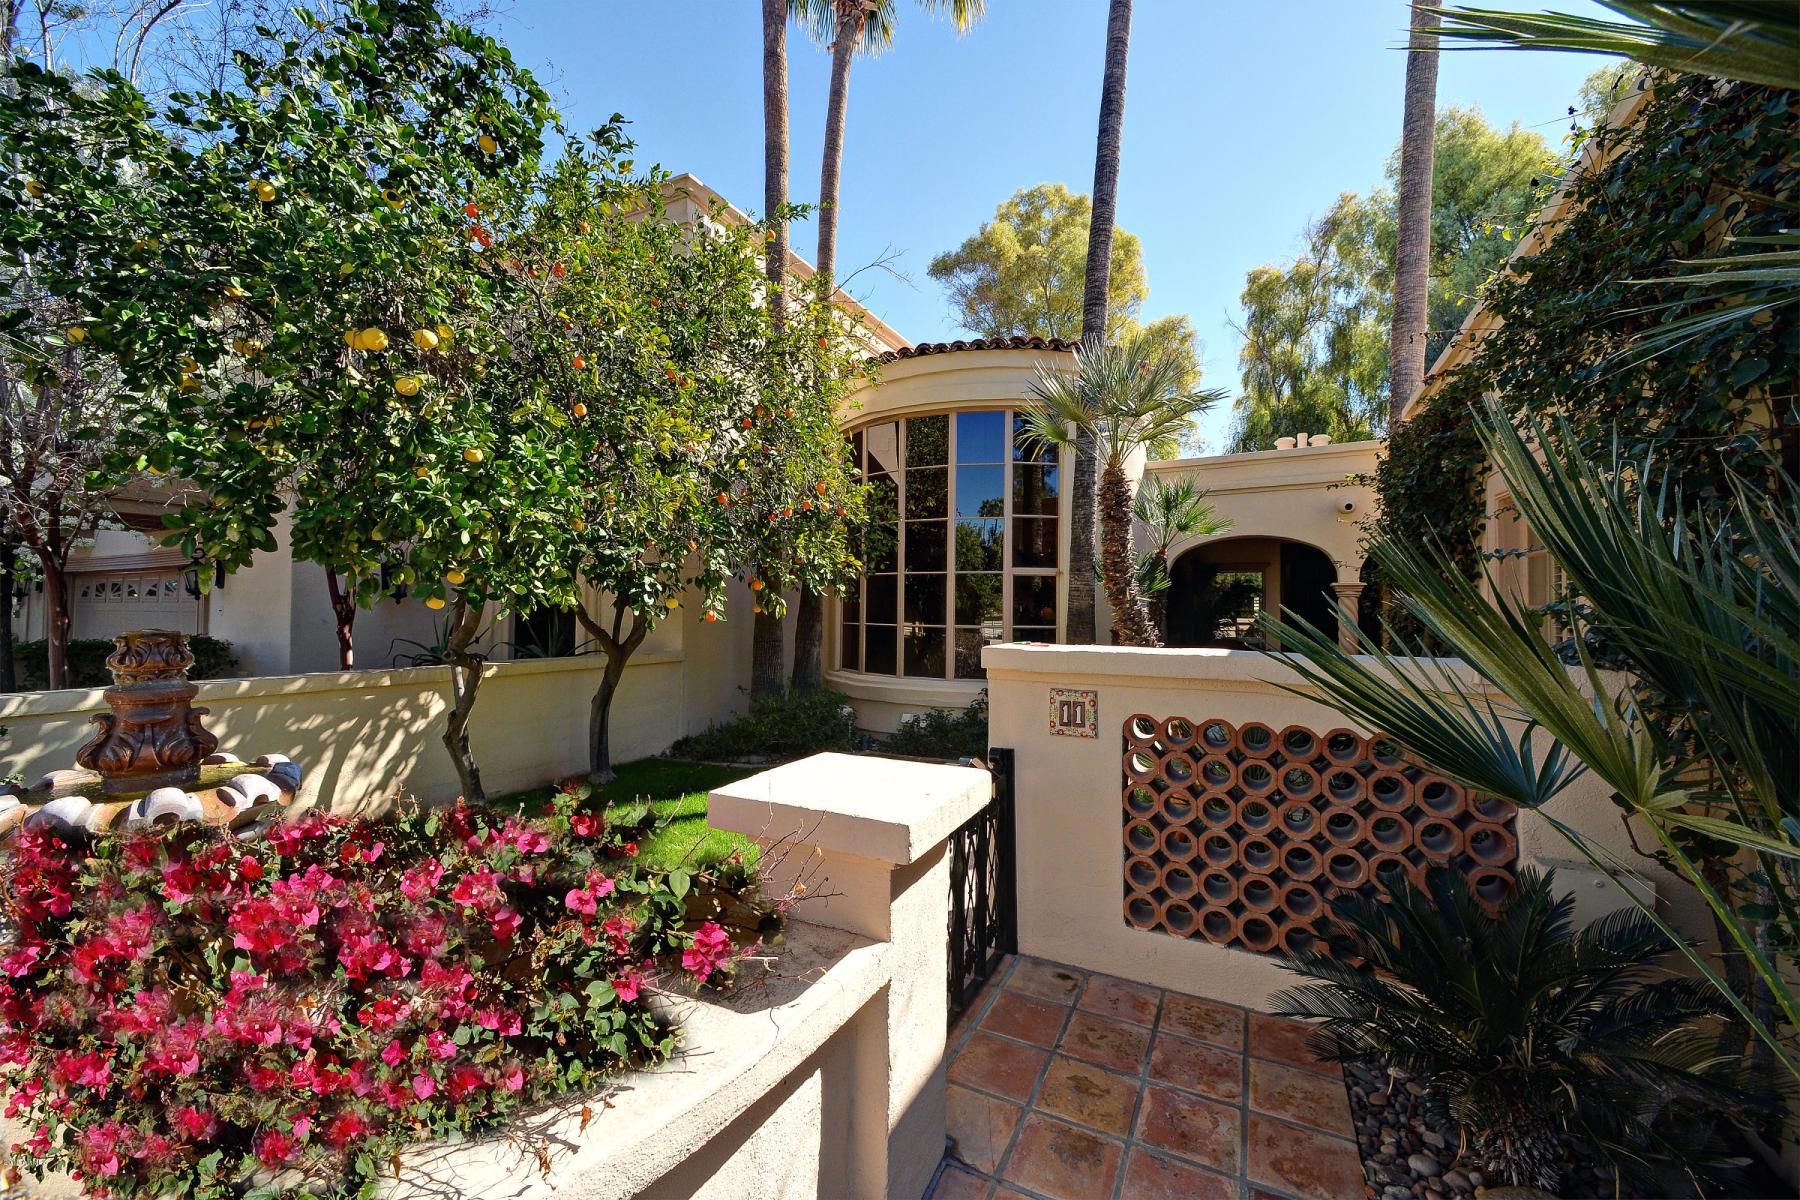 7500 E McCormick Pkwy 11, Scottsdale | $725,000